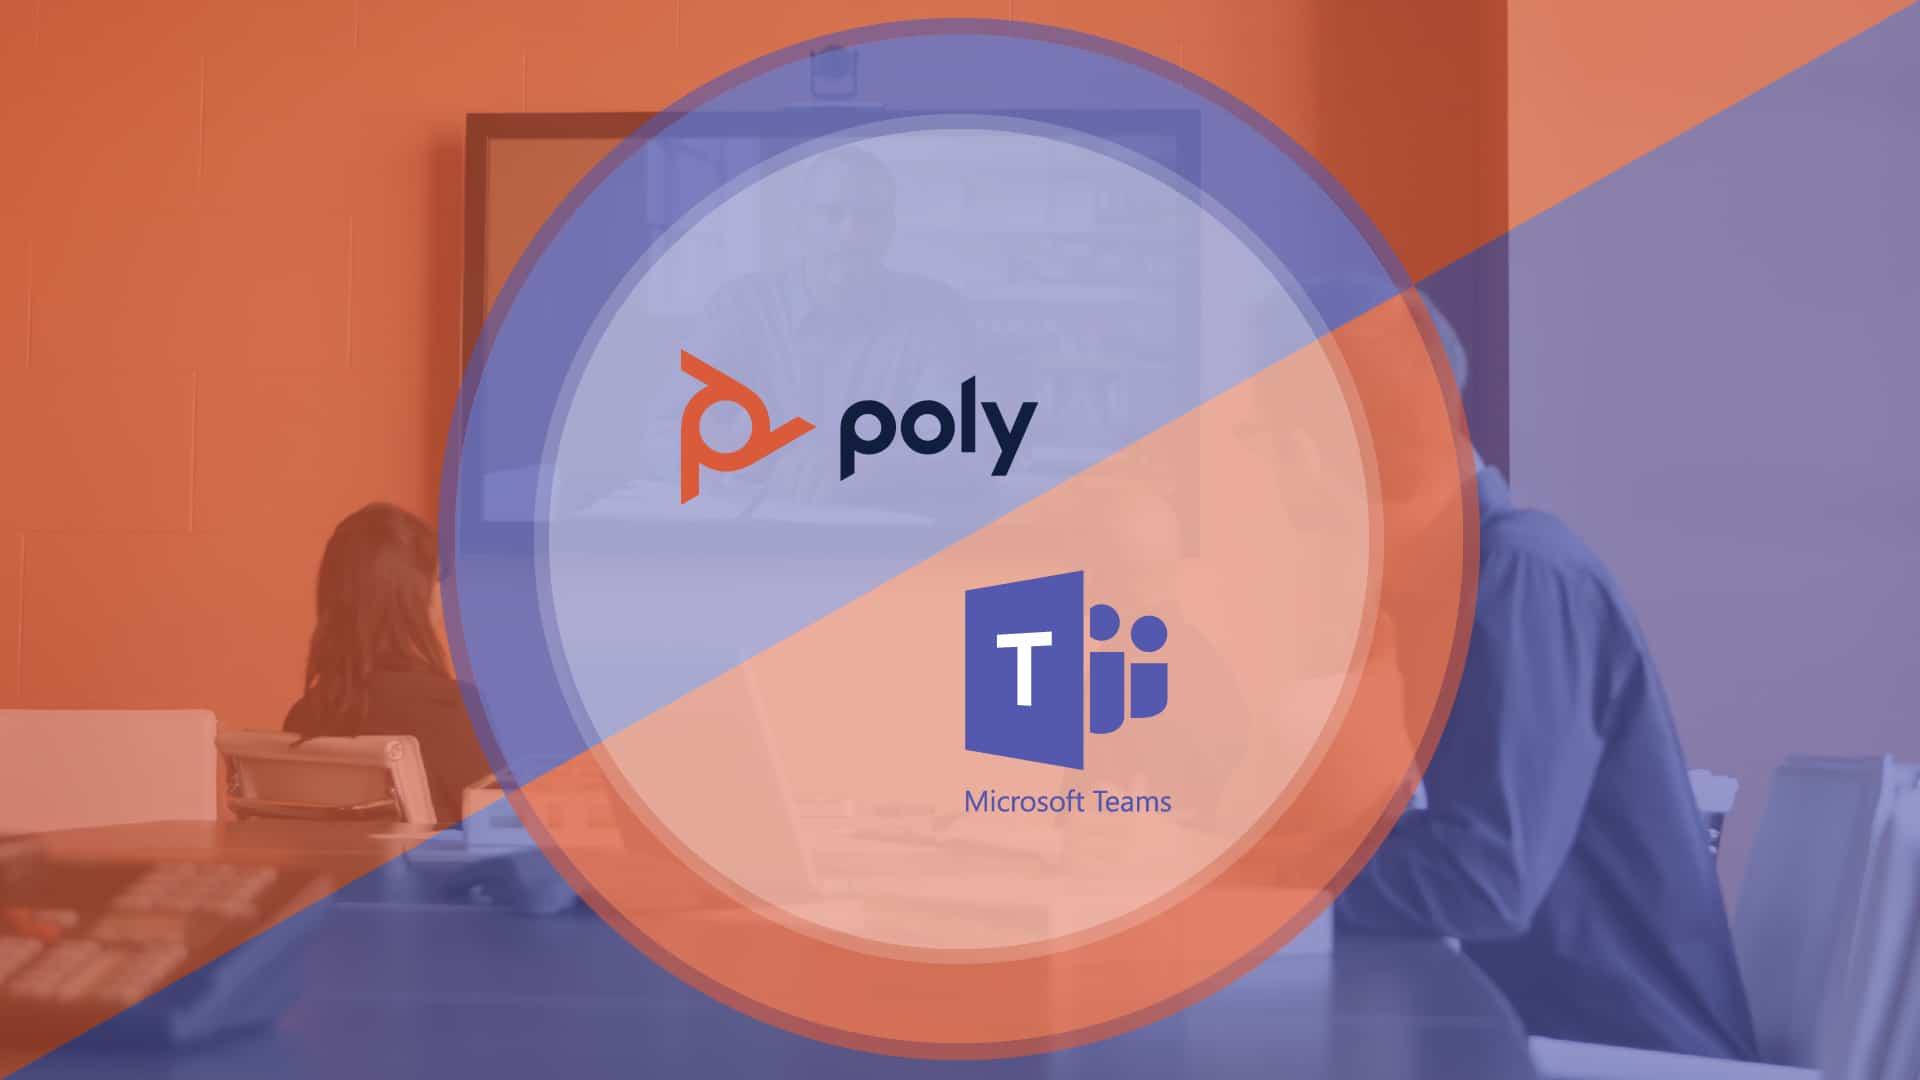 Poly & Microsoft Teams